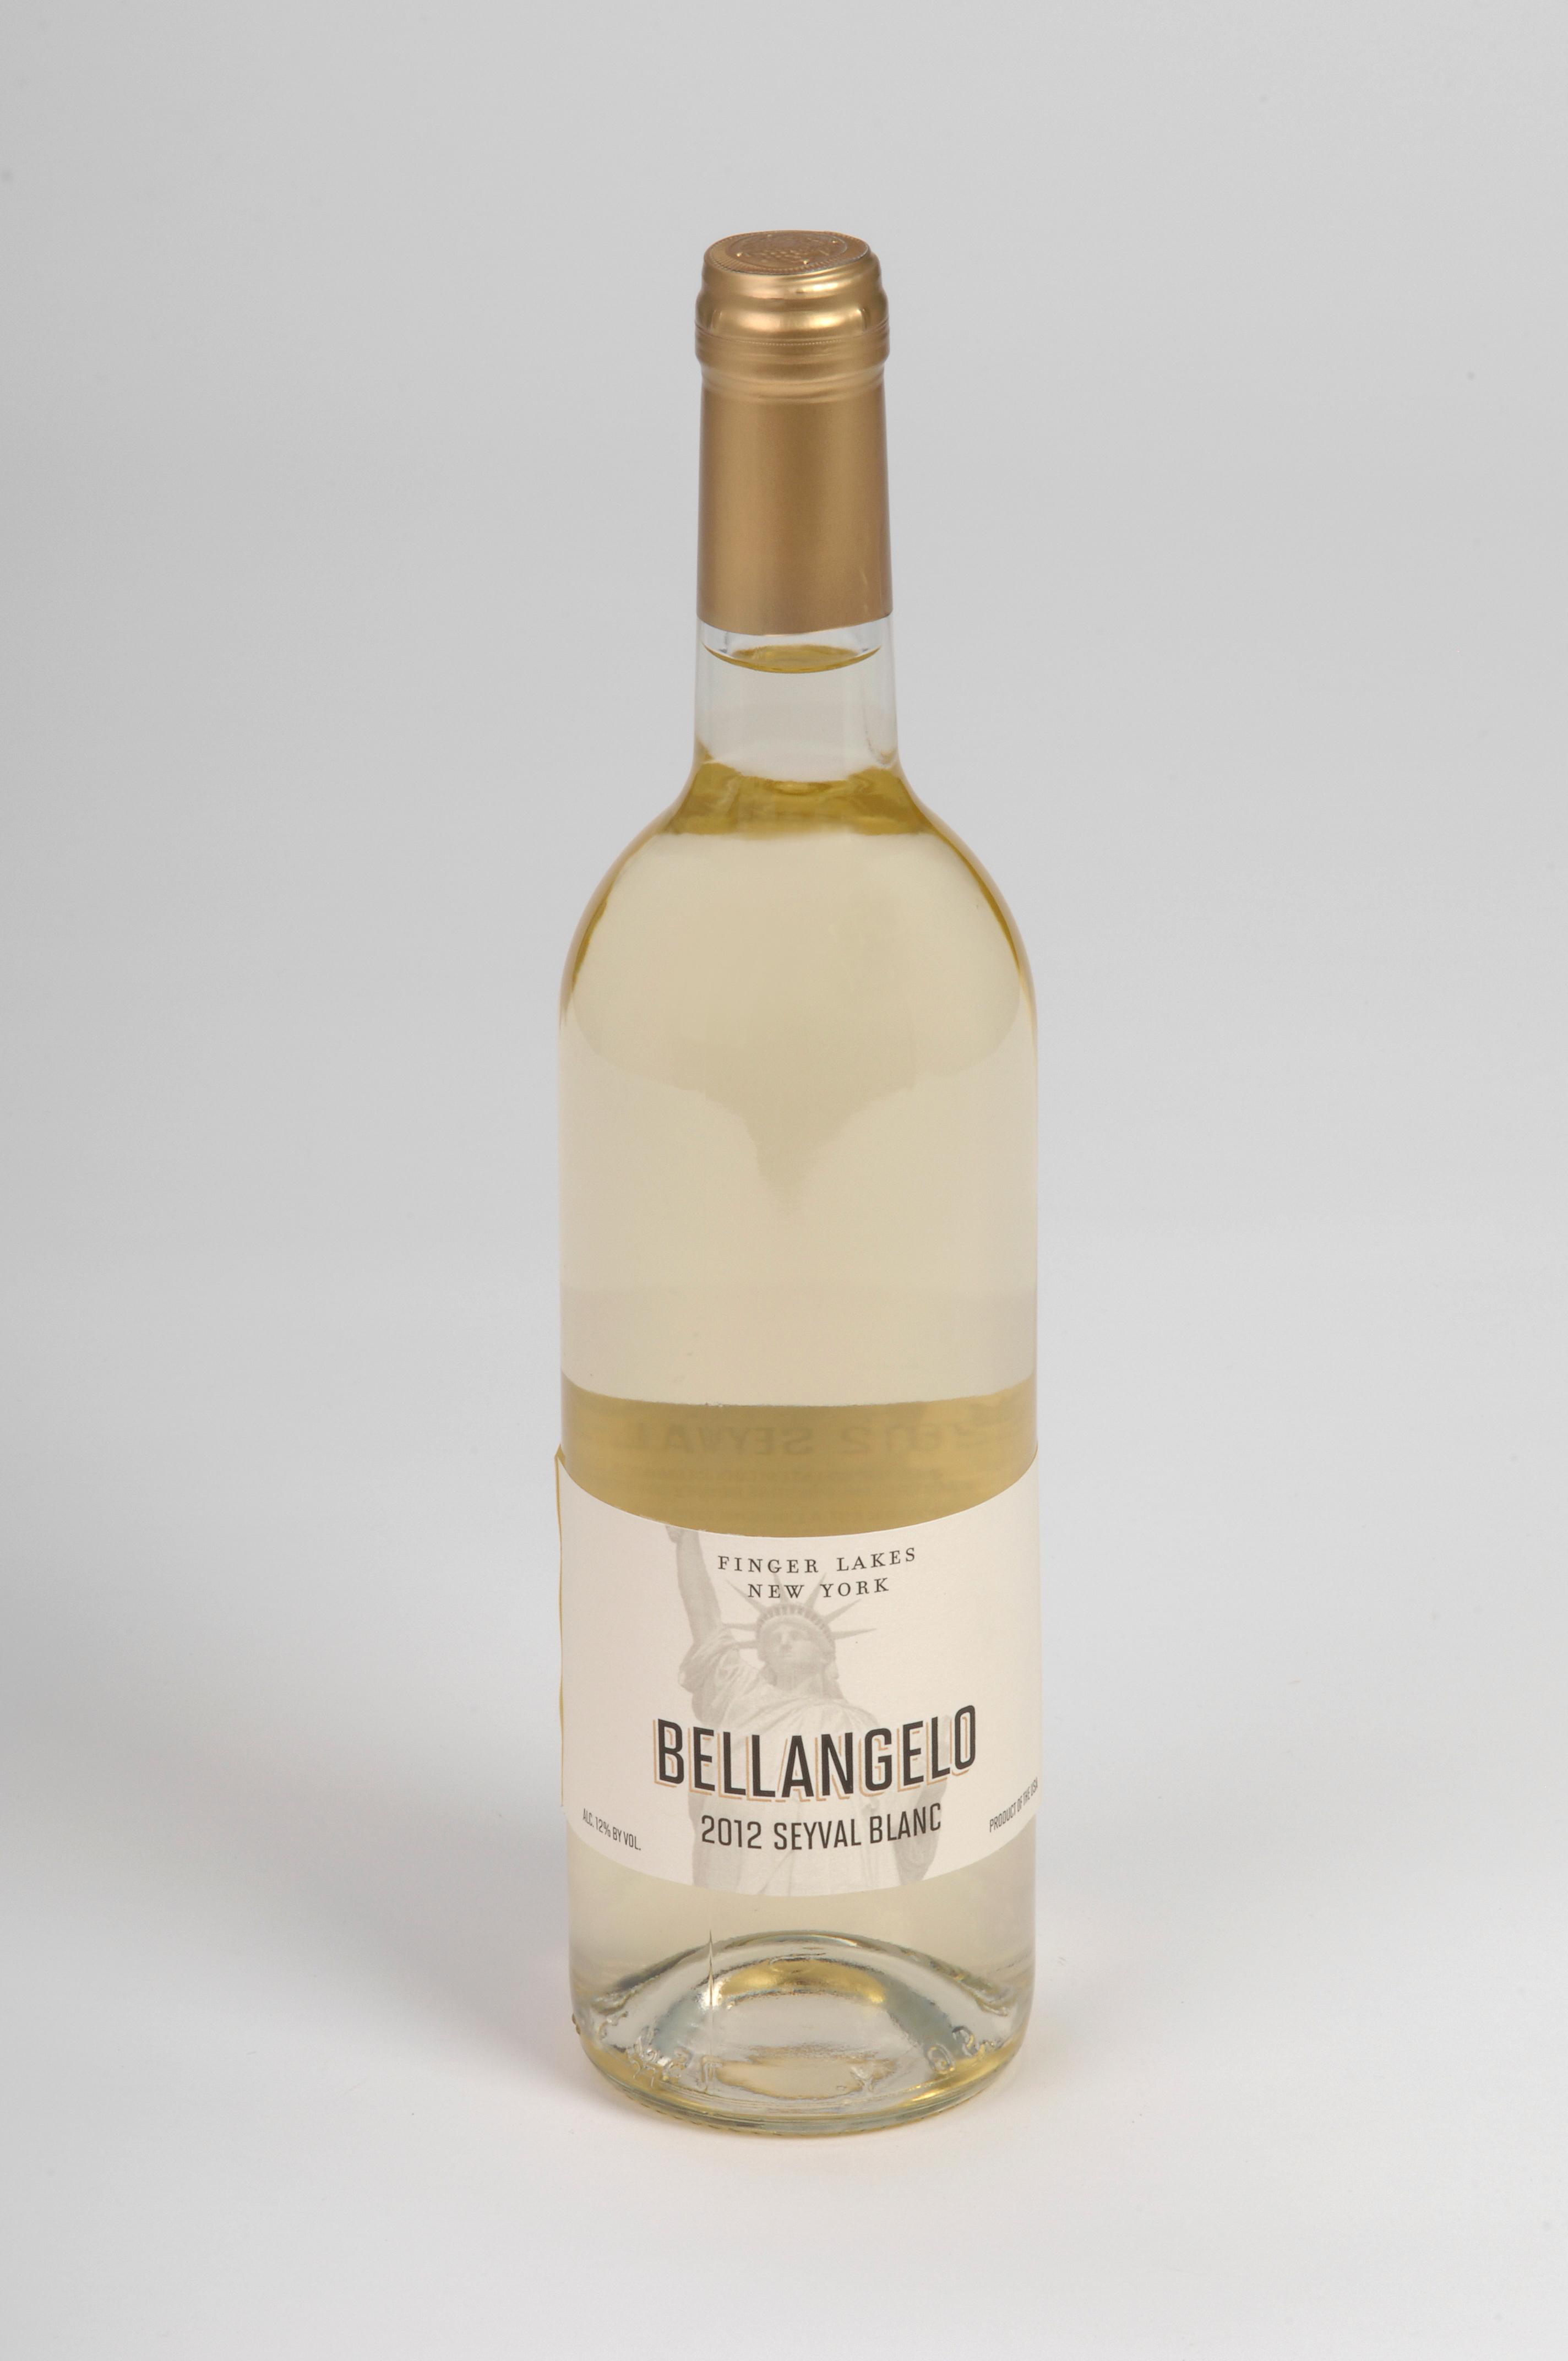 Seyval Blanc 2012